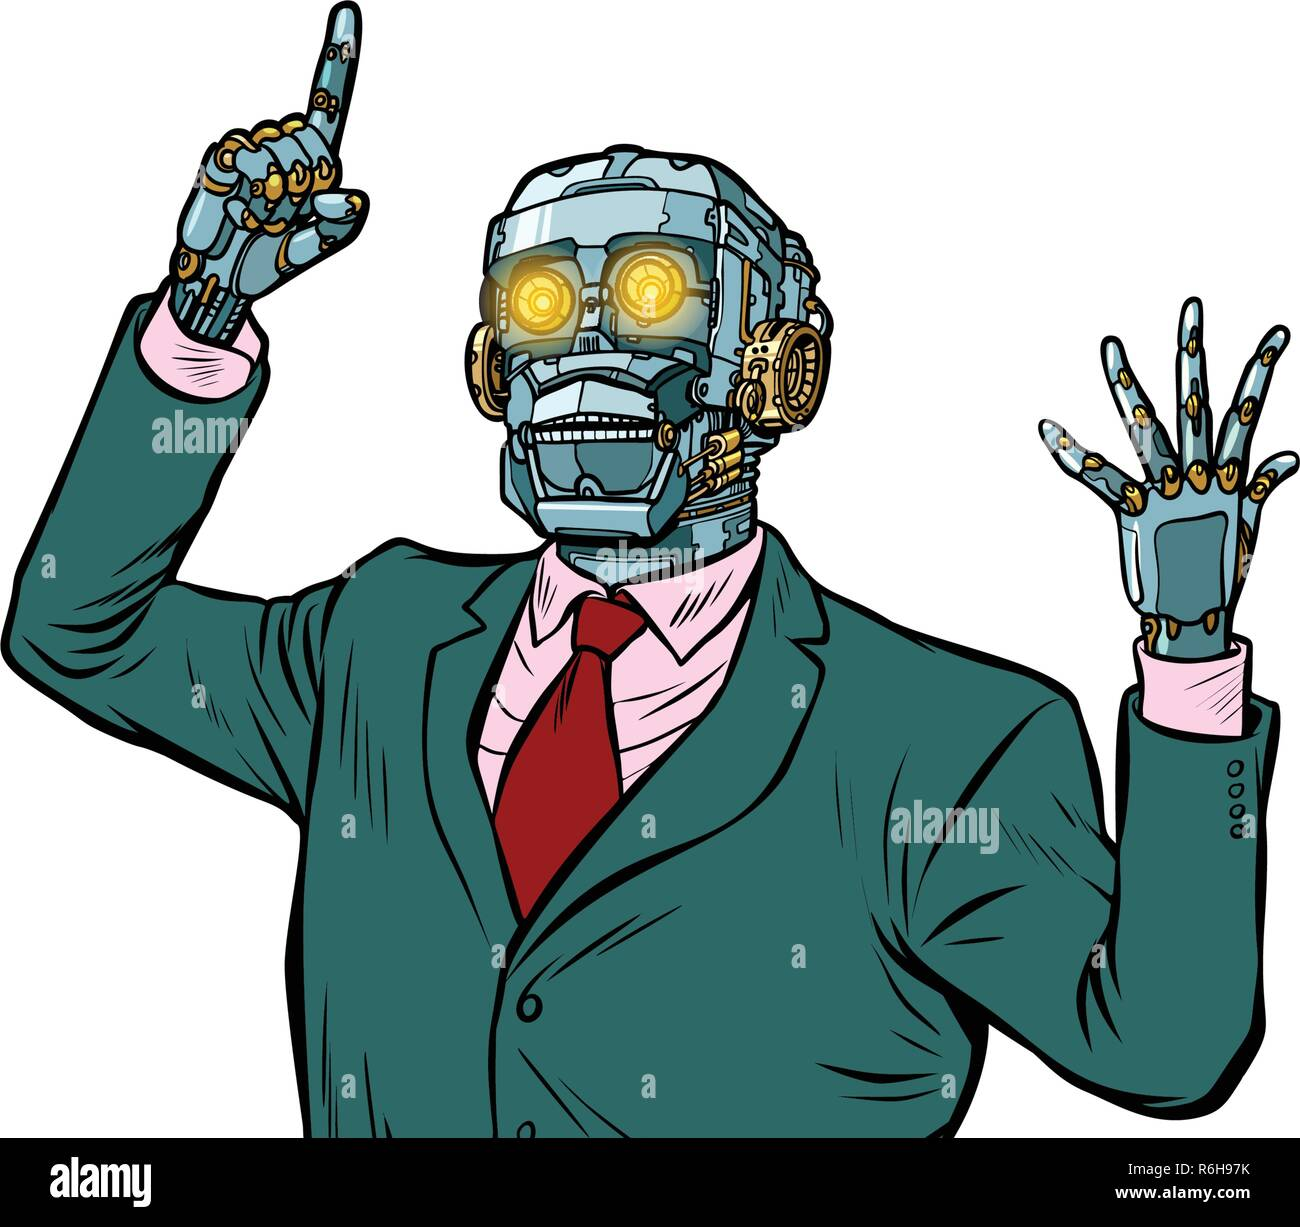 emotional speaker robot, dictatorship of gadgets. isolate on white background. Pop art retro vector illustration - Stock Vector